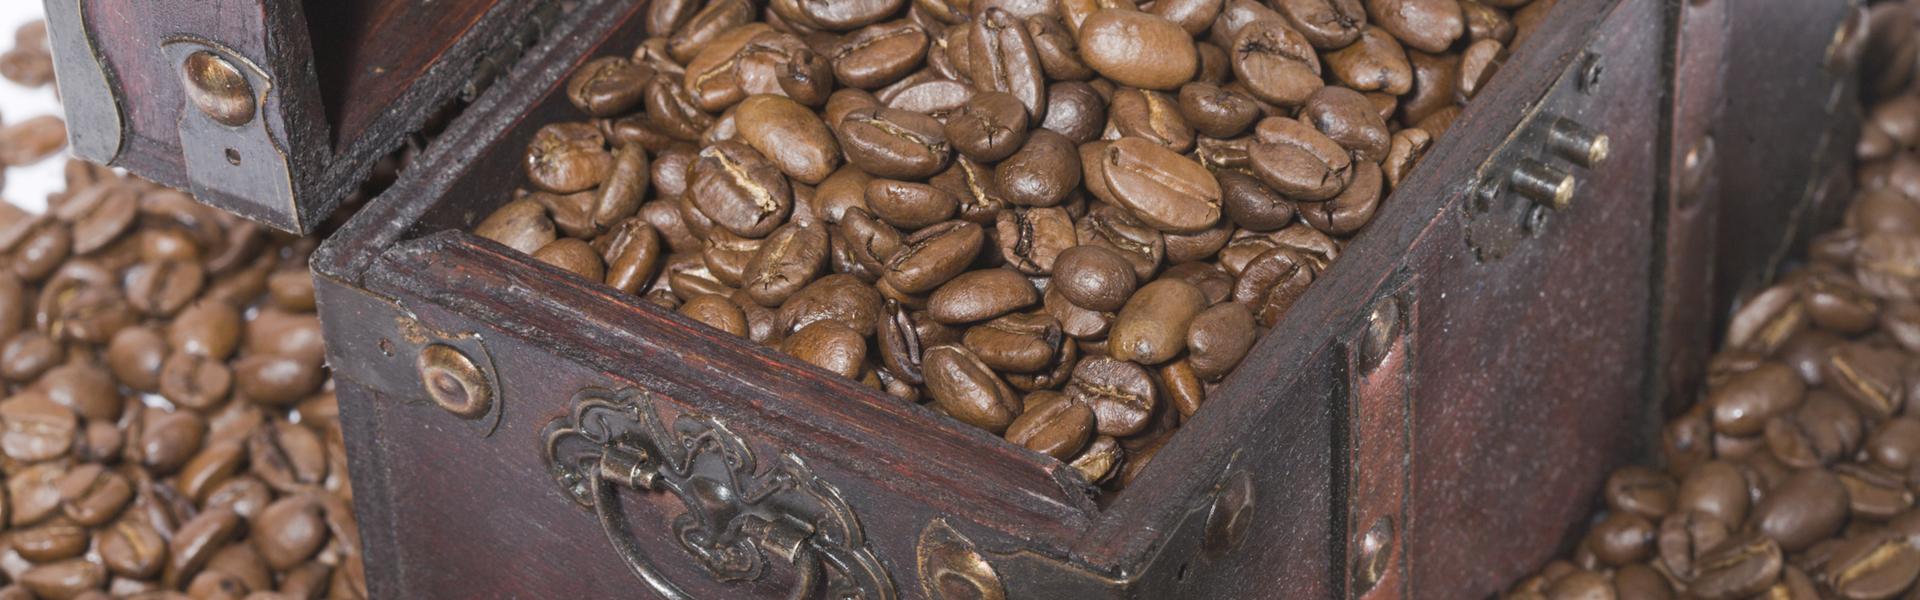 Coffee beans storage